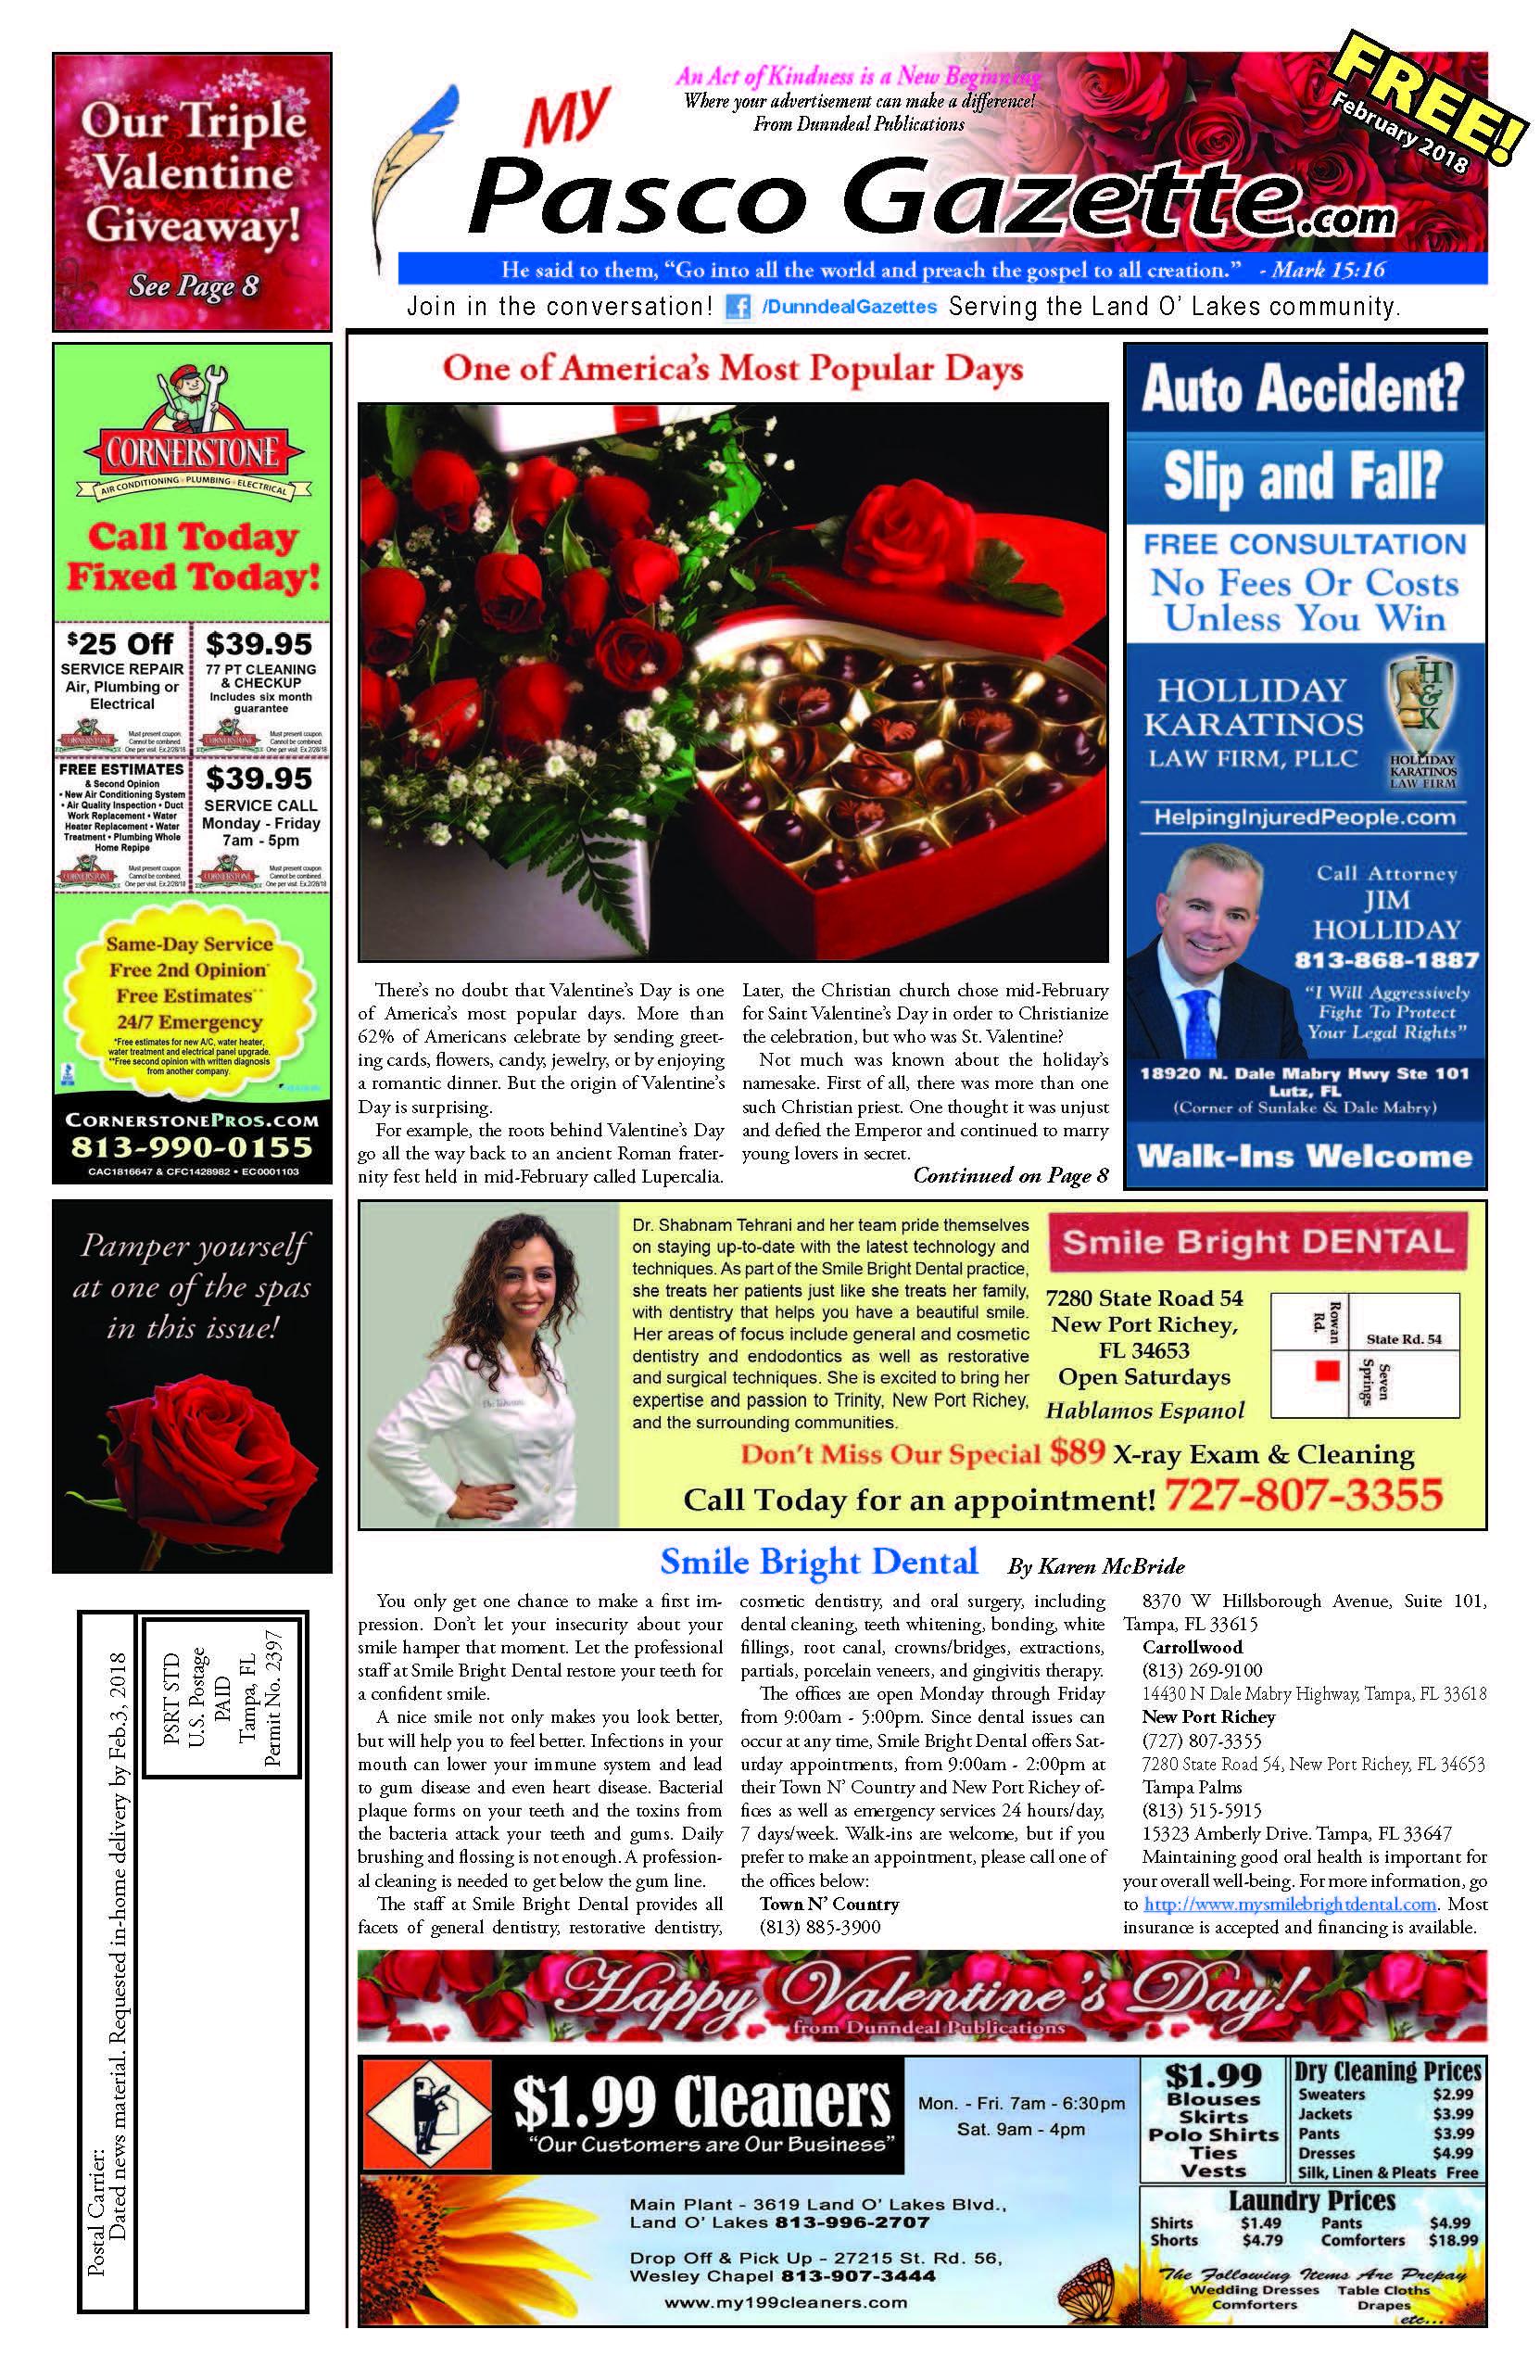 Pasco-Gazette-February-2018_Page_01.jpg